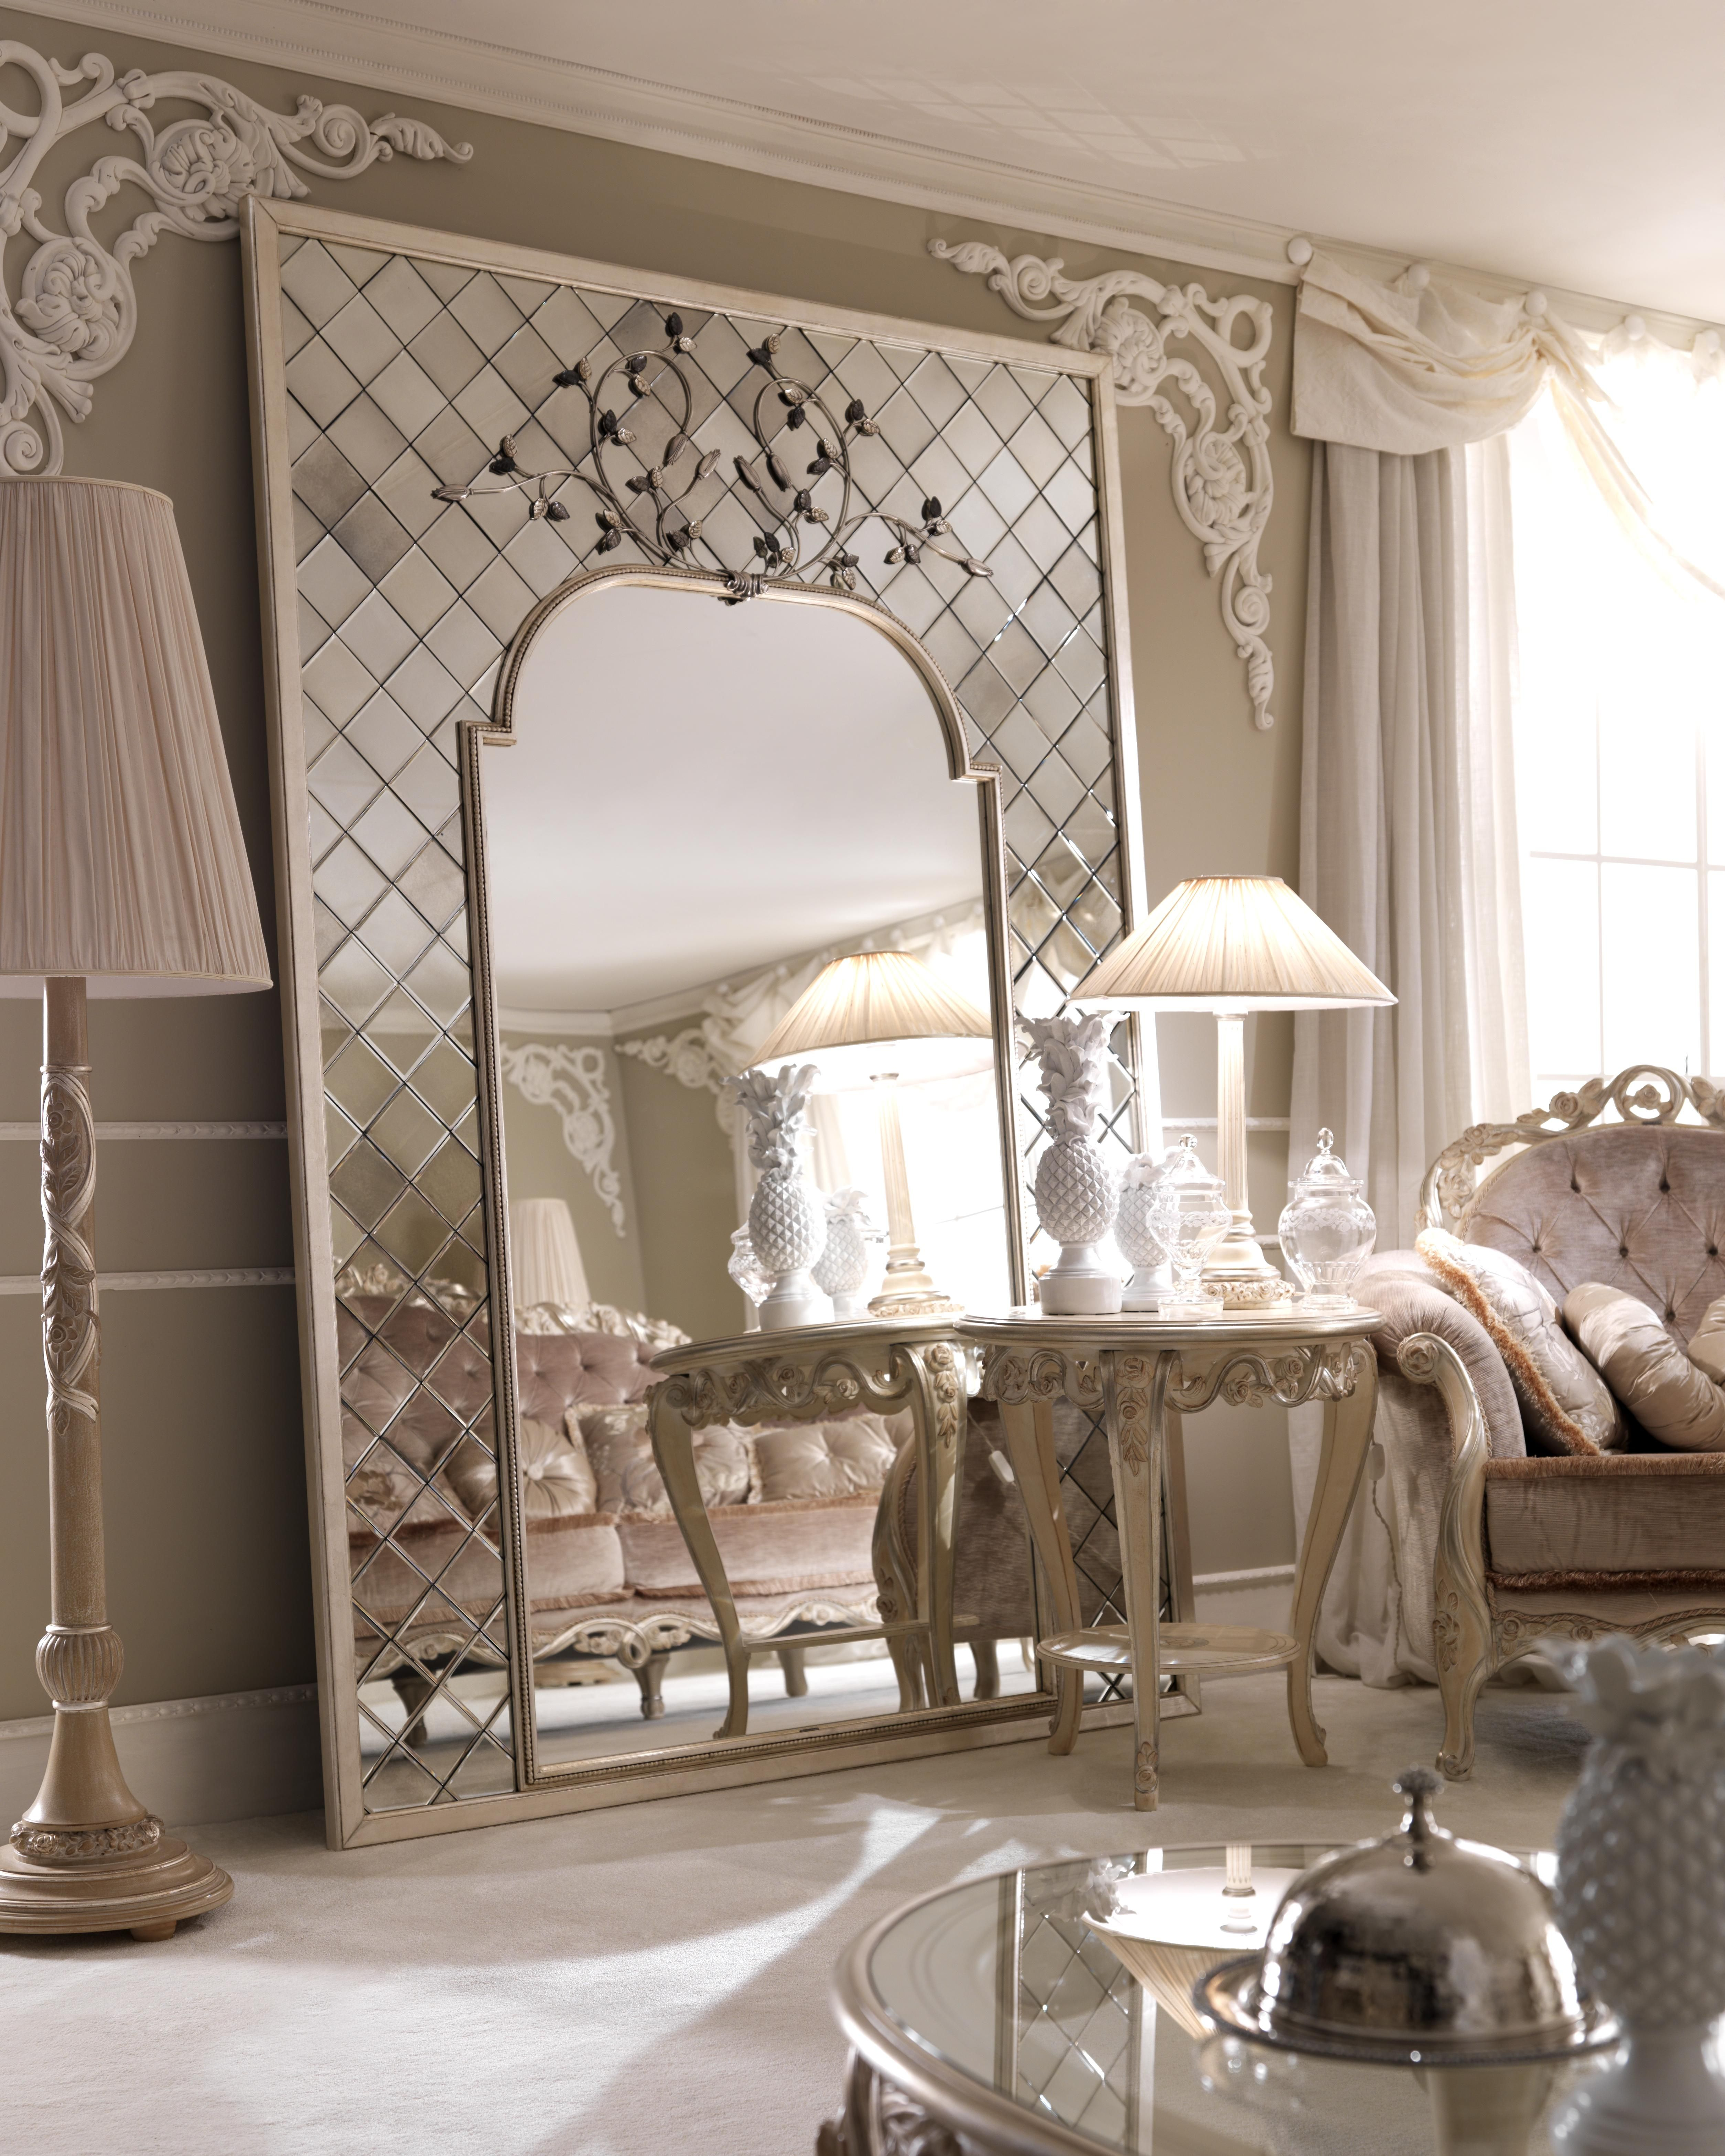 Savio Firmino | My home inspiration | Pinterest | Mirror mirror ...